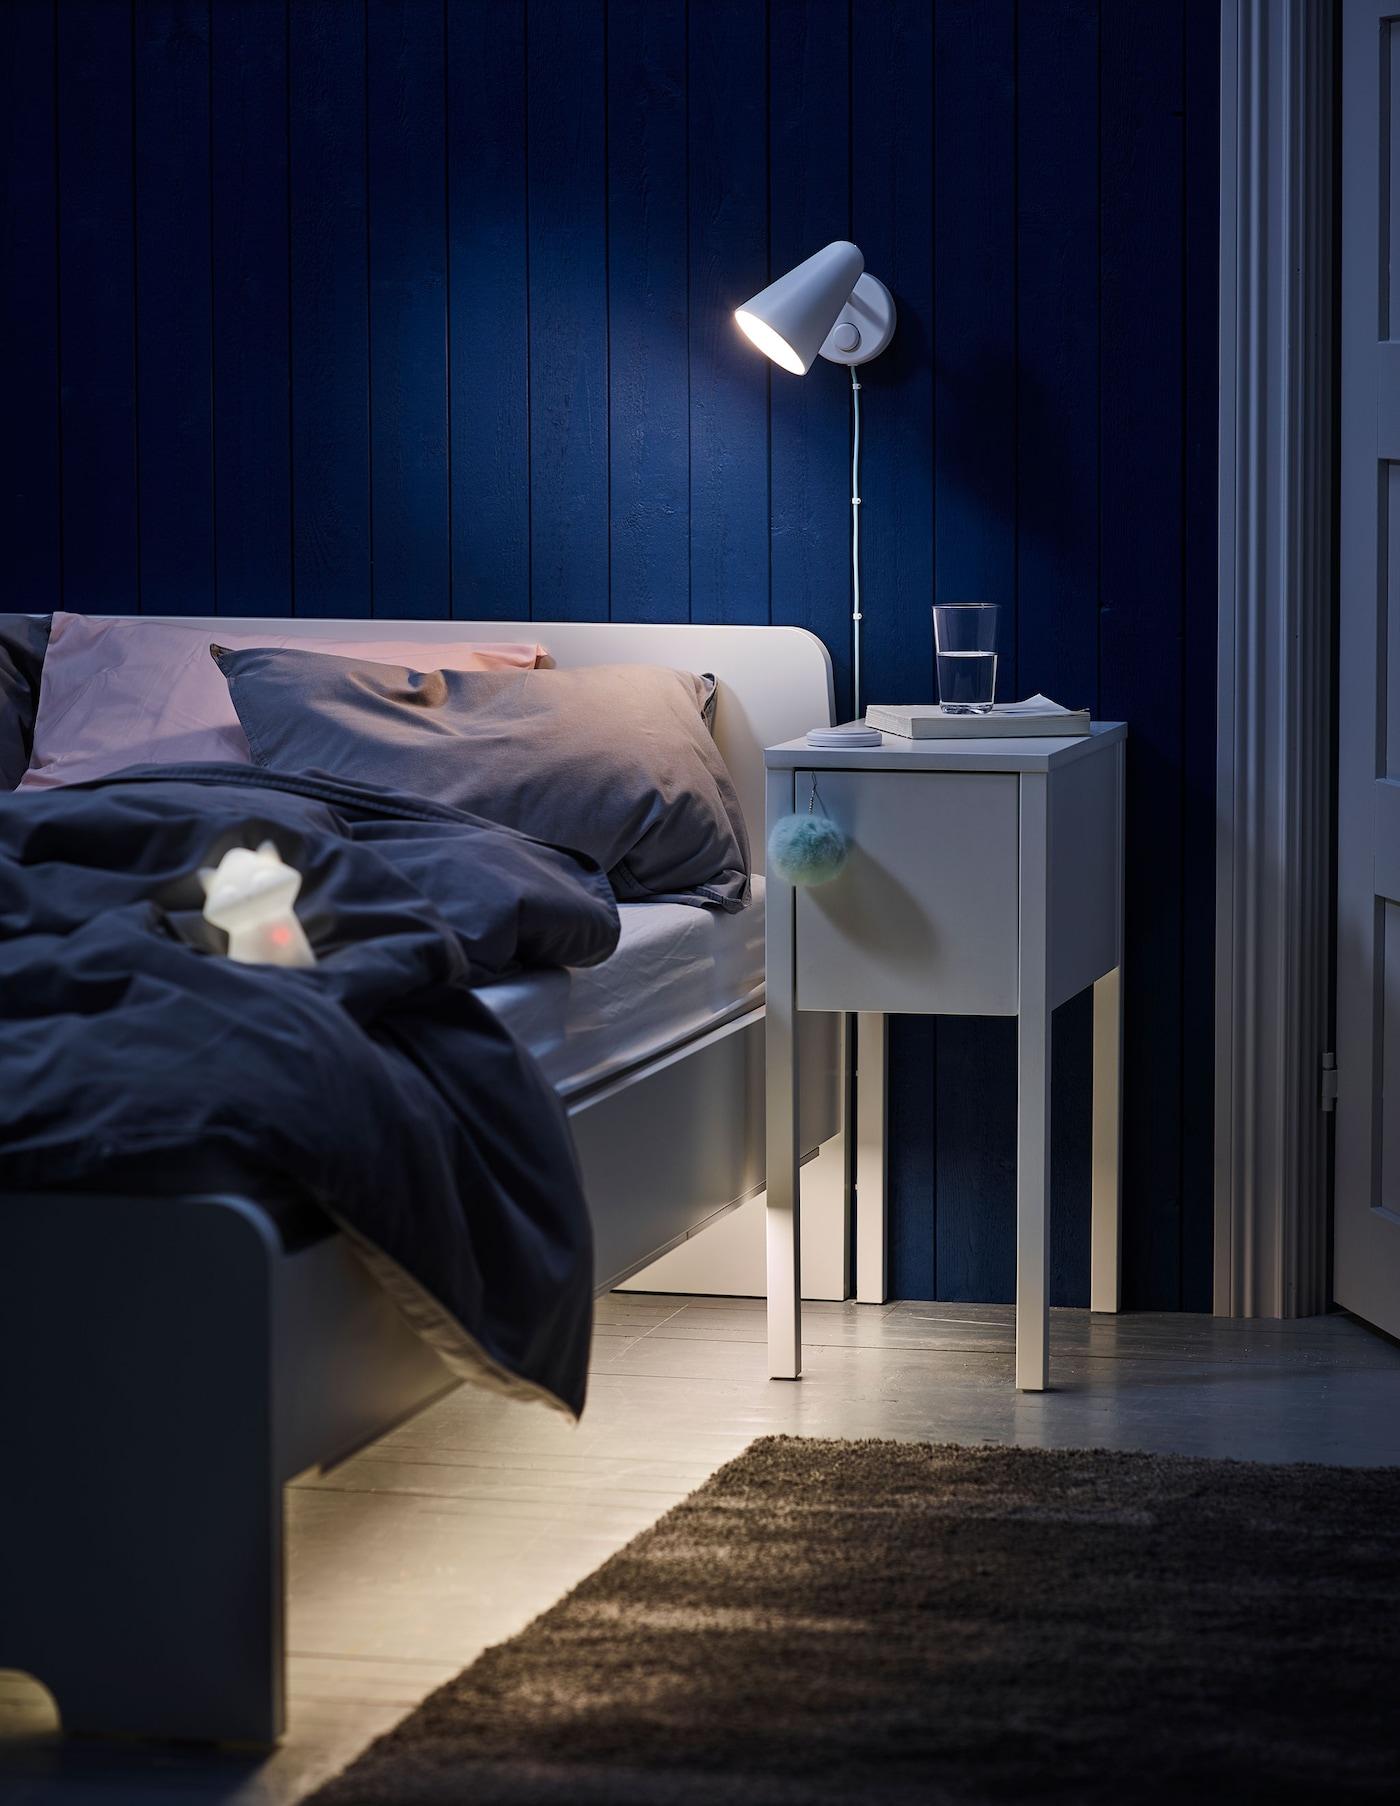 ikea childrens night light